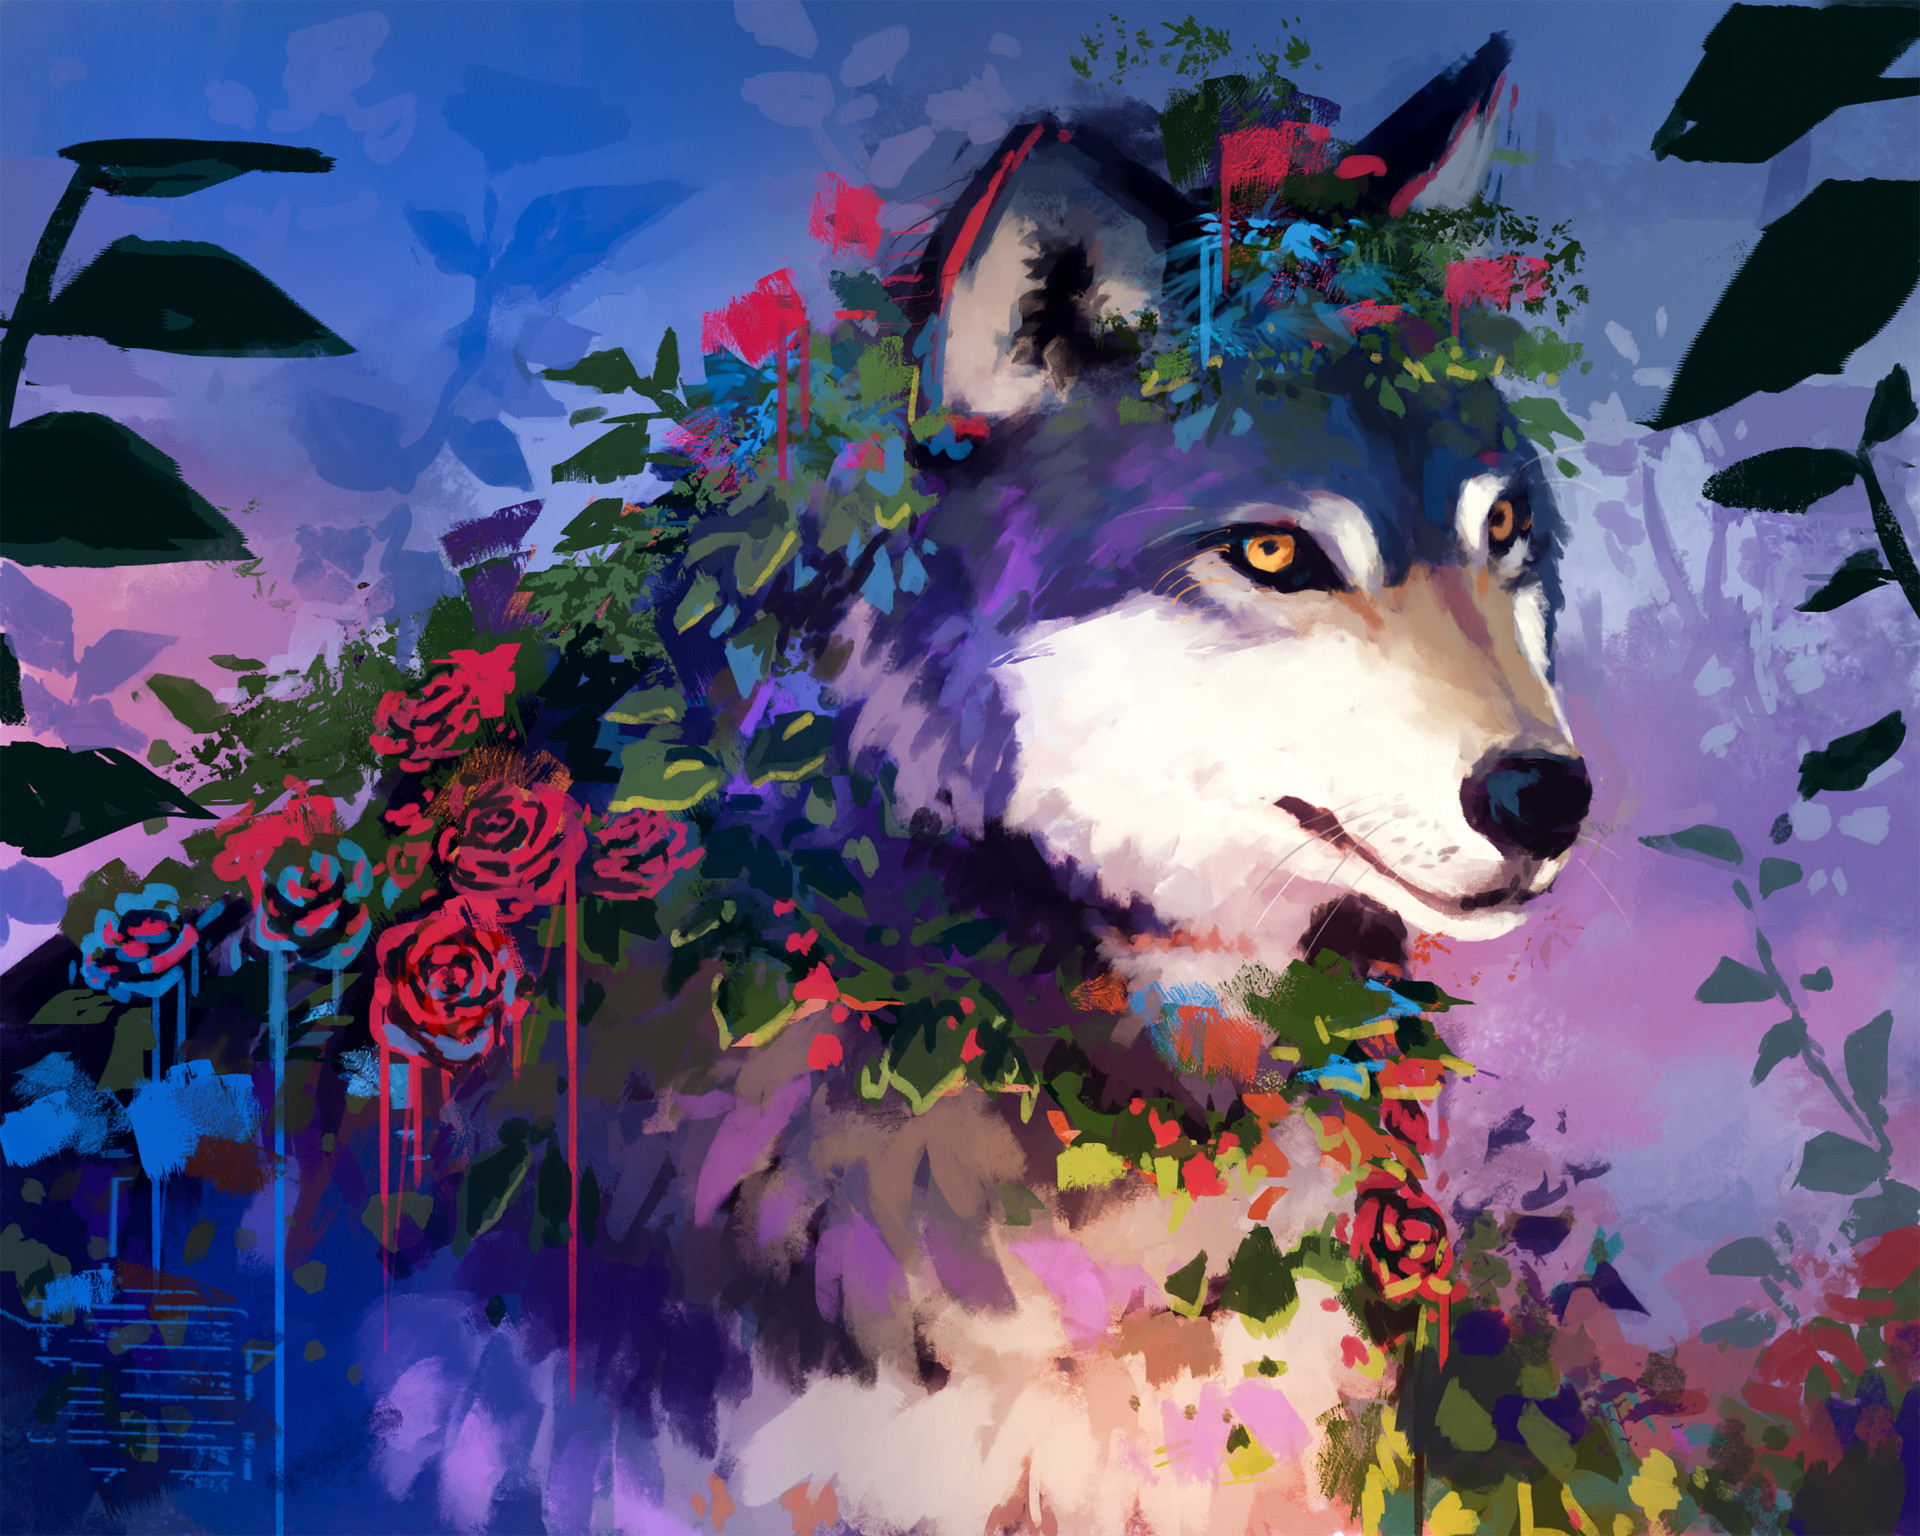 General 1920x1536 Hannah Jones digital art painting colorful dog roses plants animals flowers